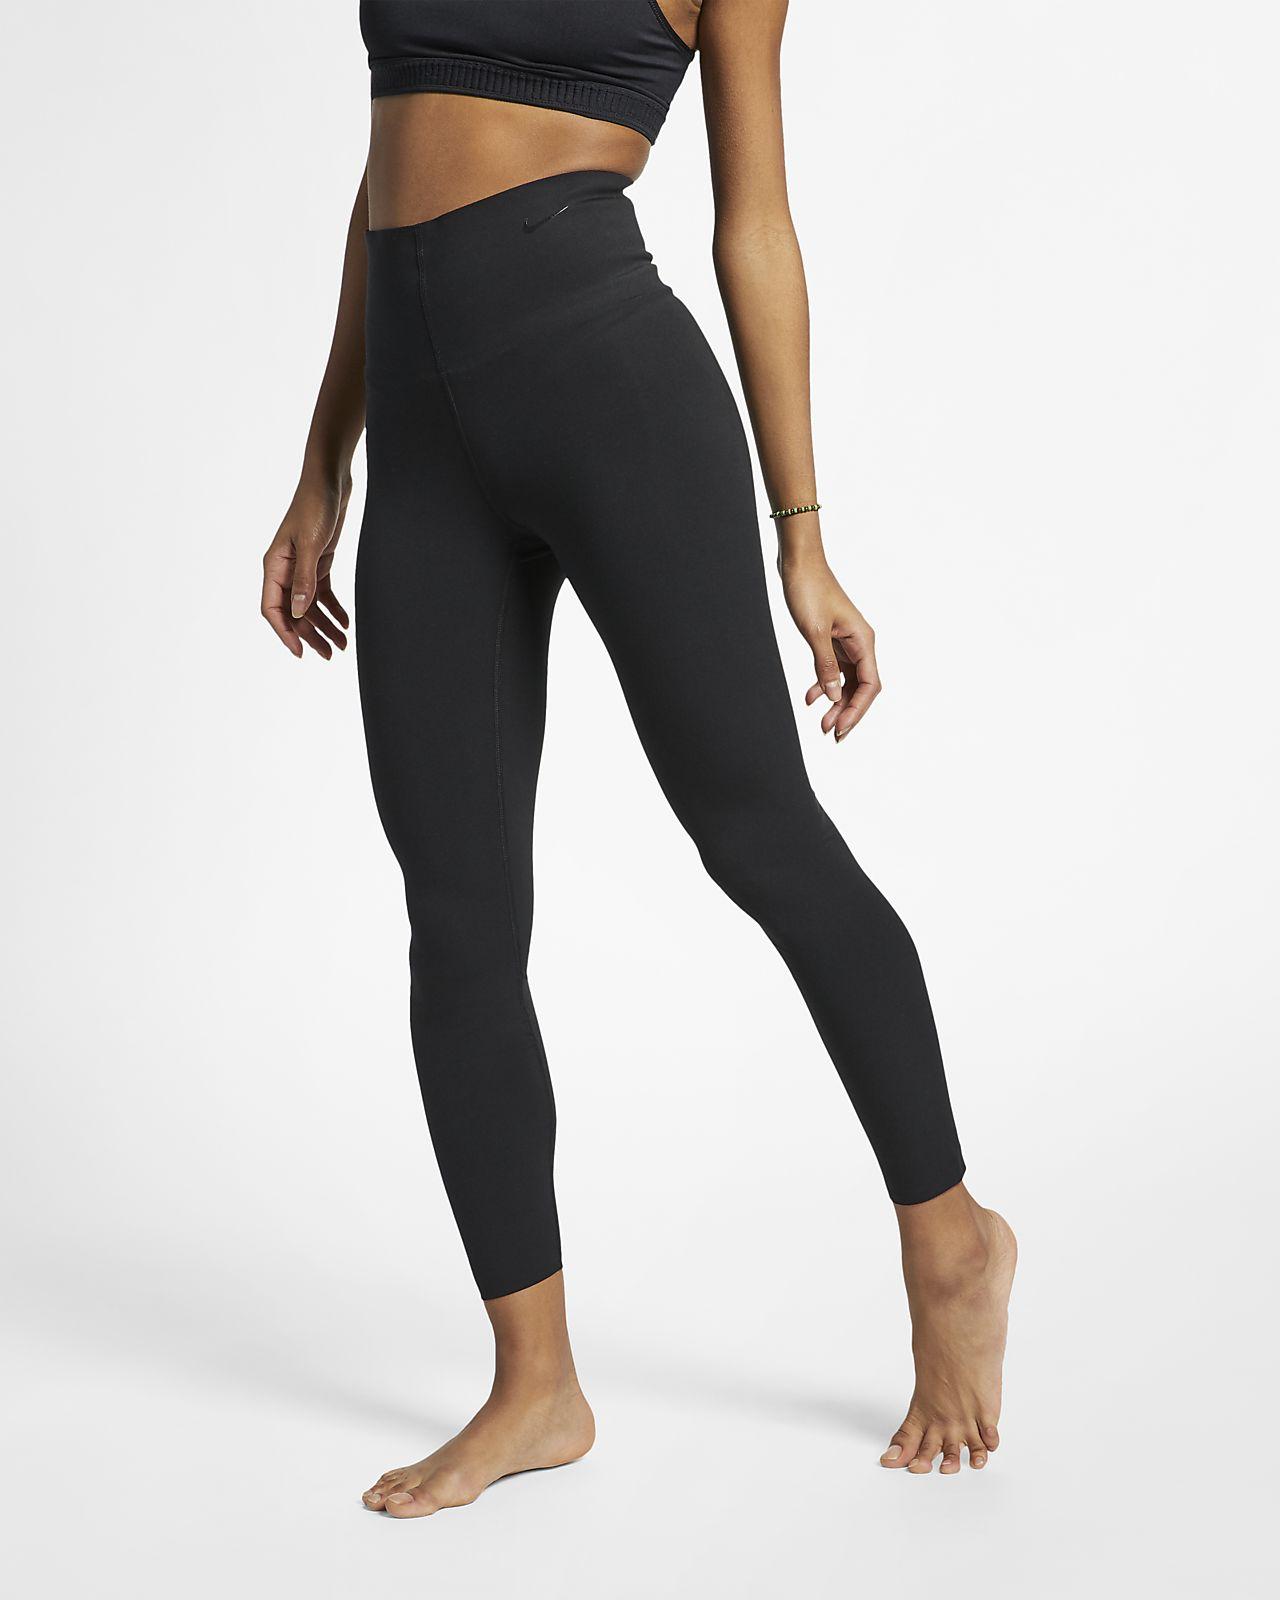 KNEE LENGTH Womens Leggings COTTON Stretch Gym SIZE 8 10 12 14 16 18 20 22 24 26